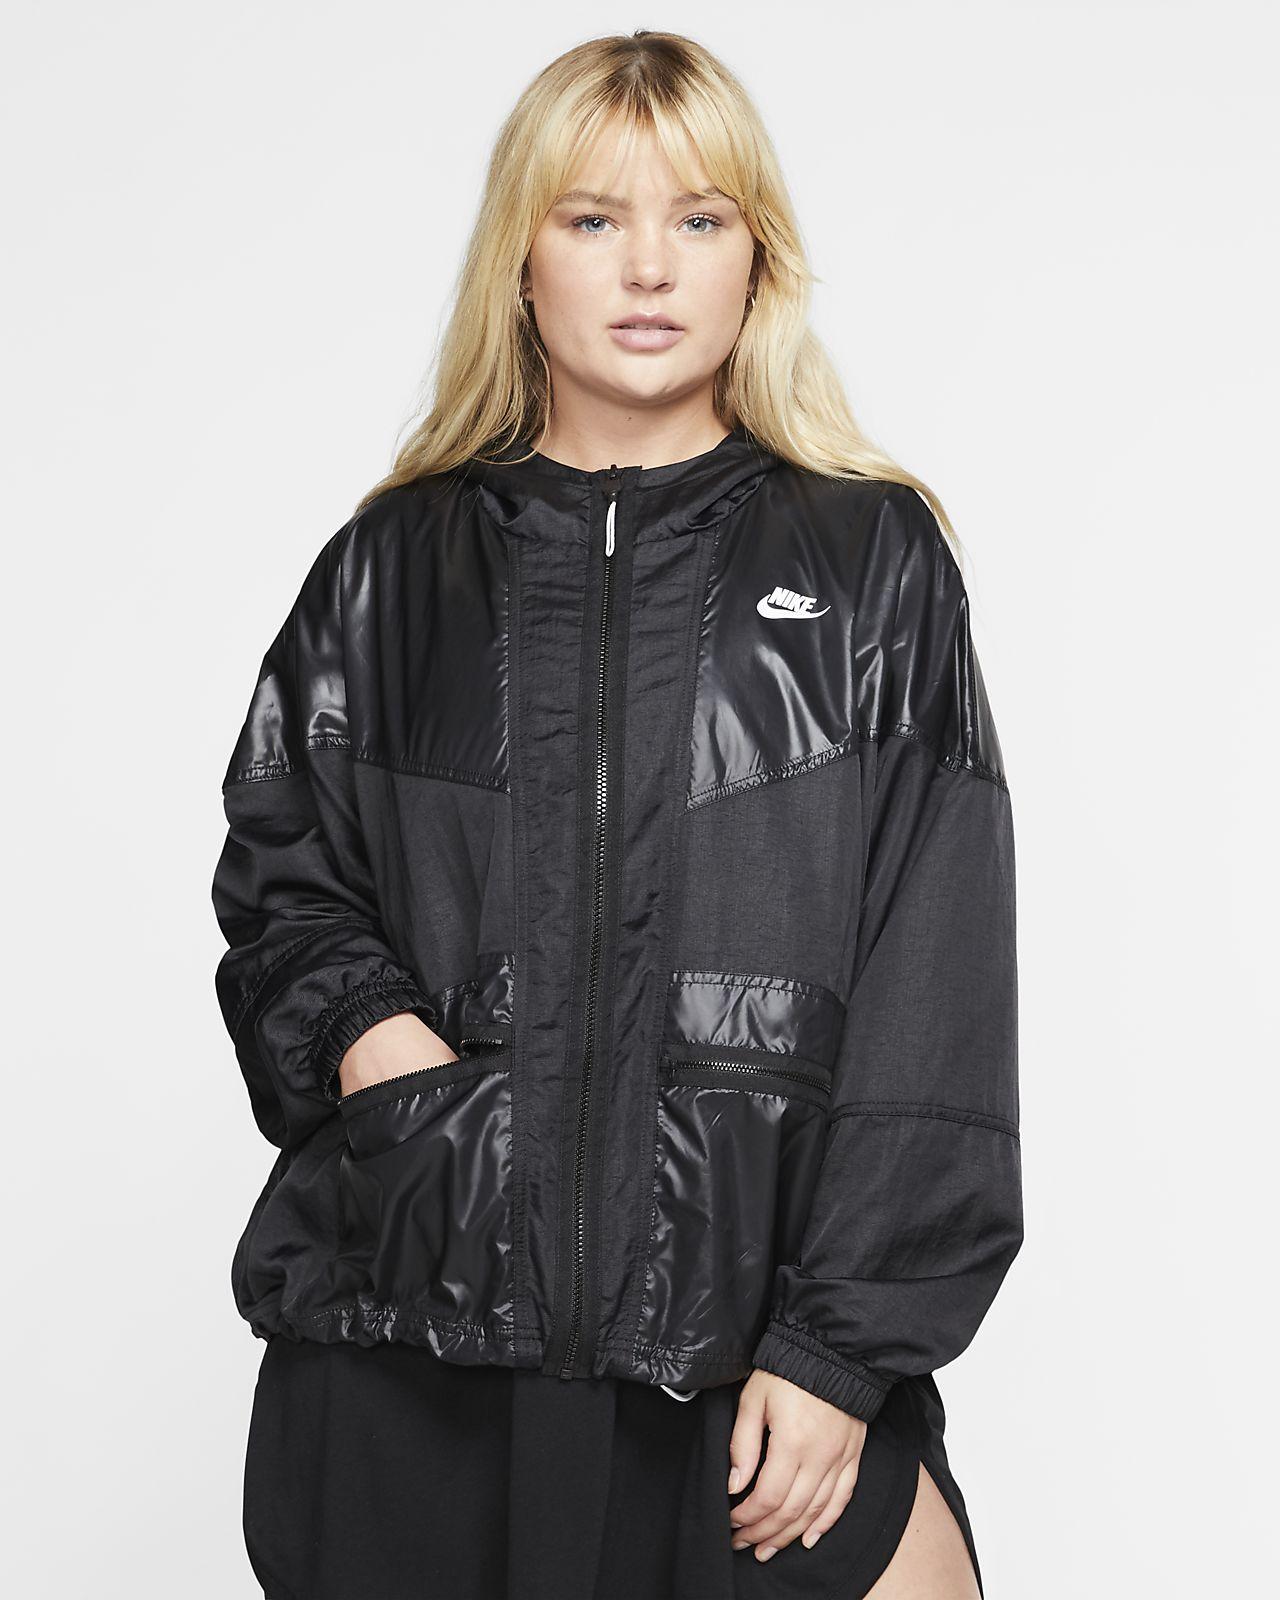 Veste cargo Nike Sportswear Windrunner pour Femme (grande taille)